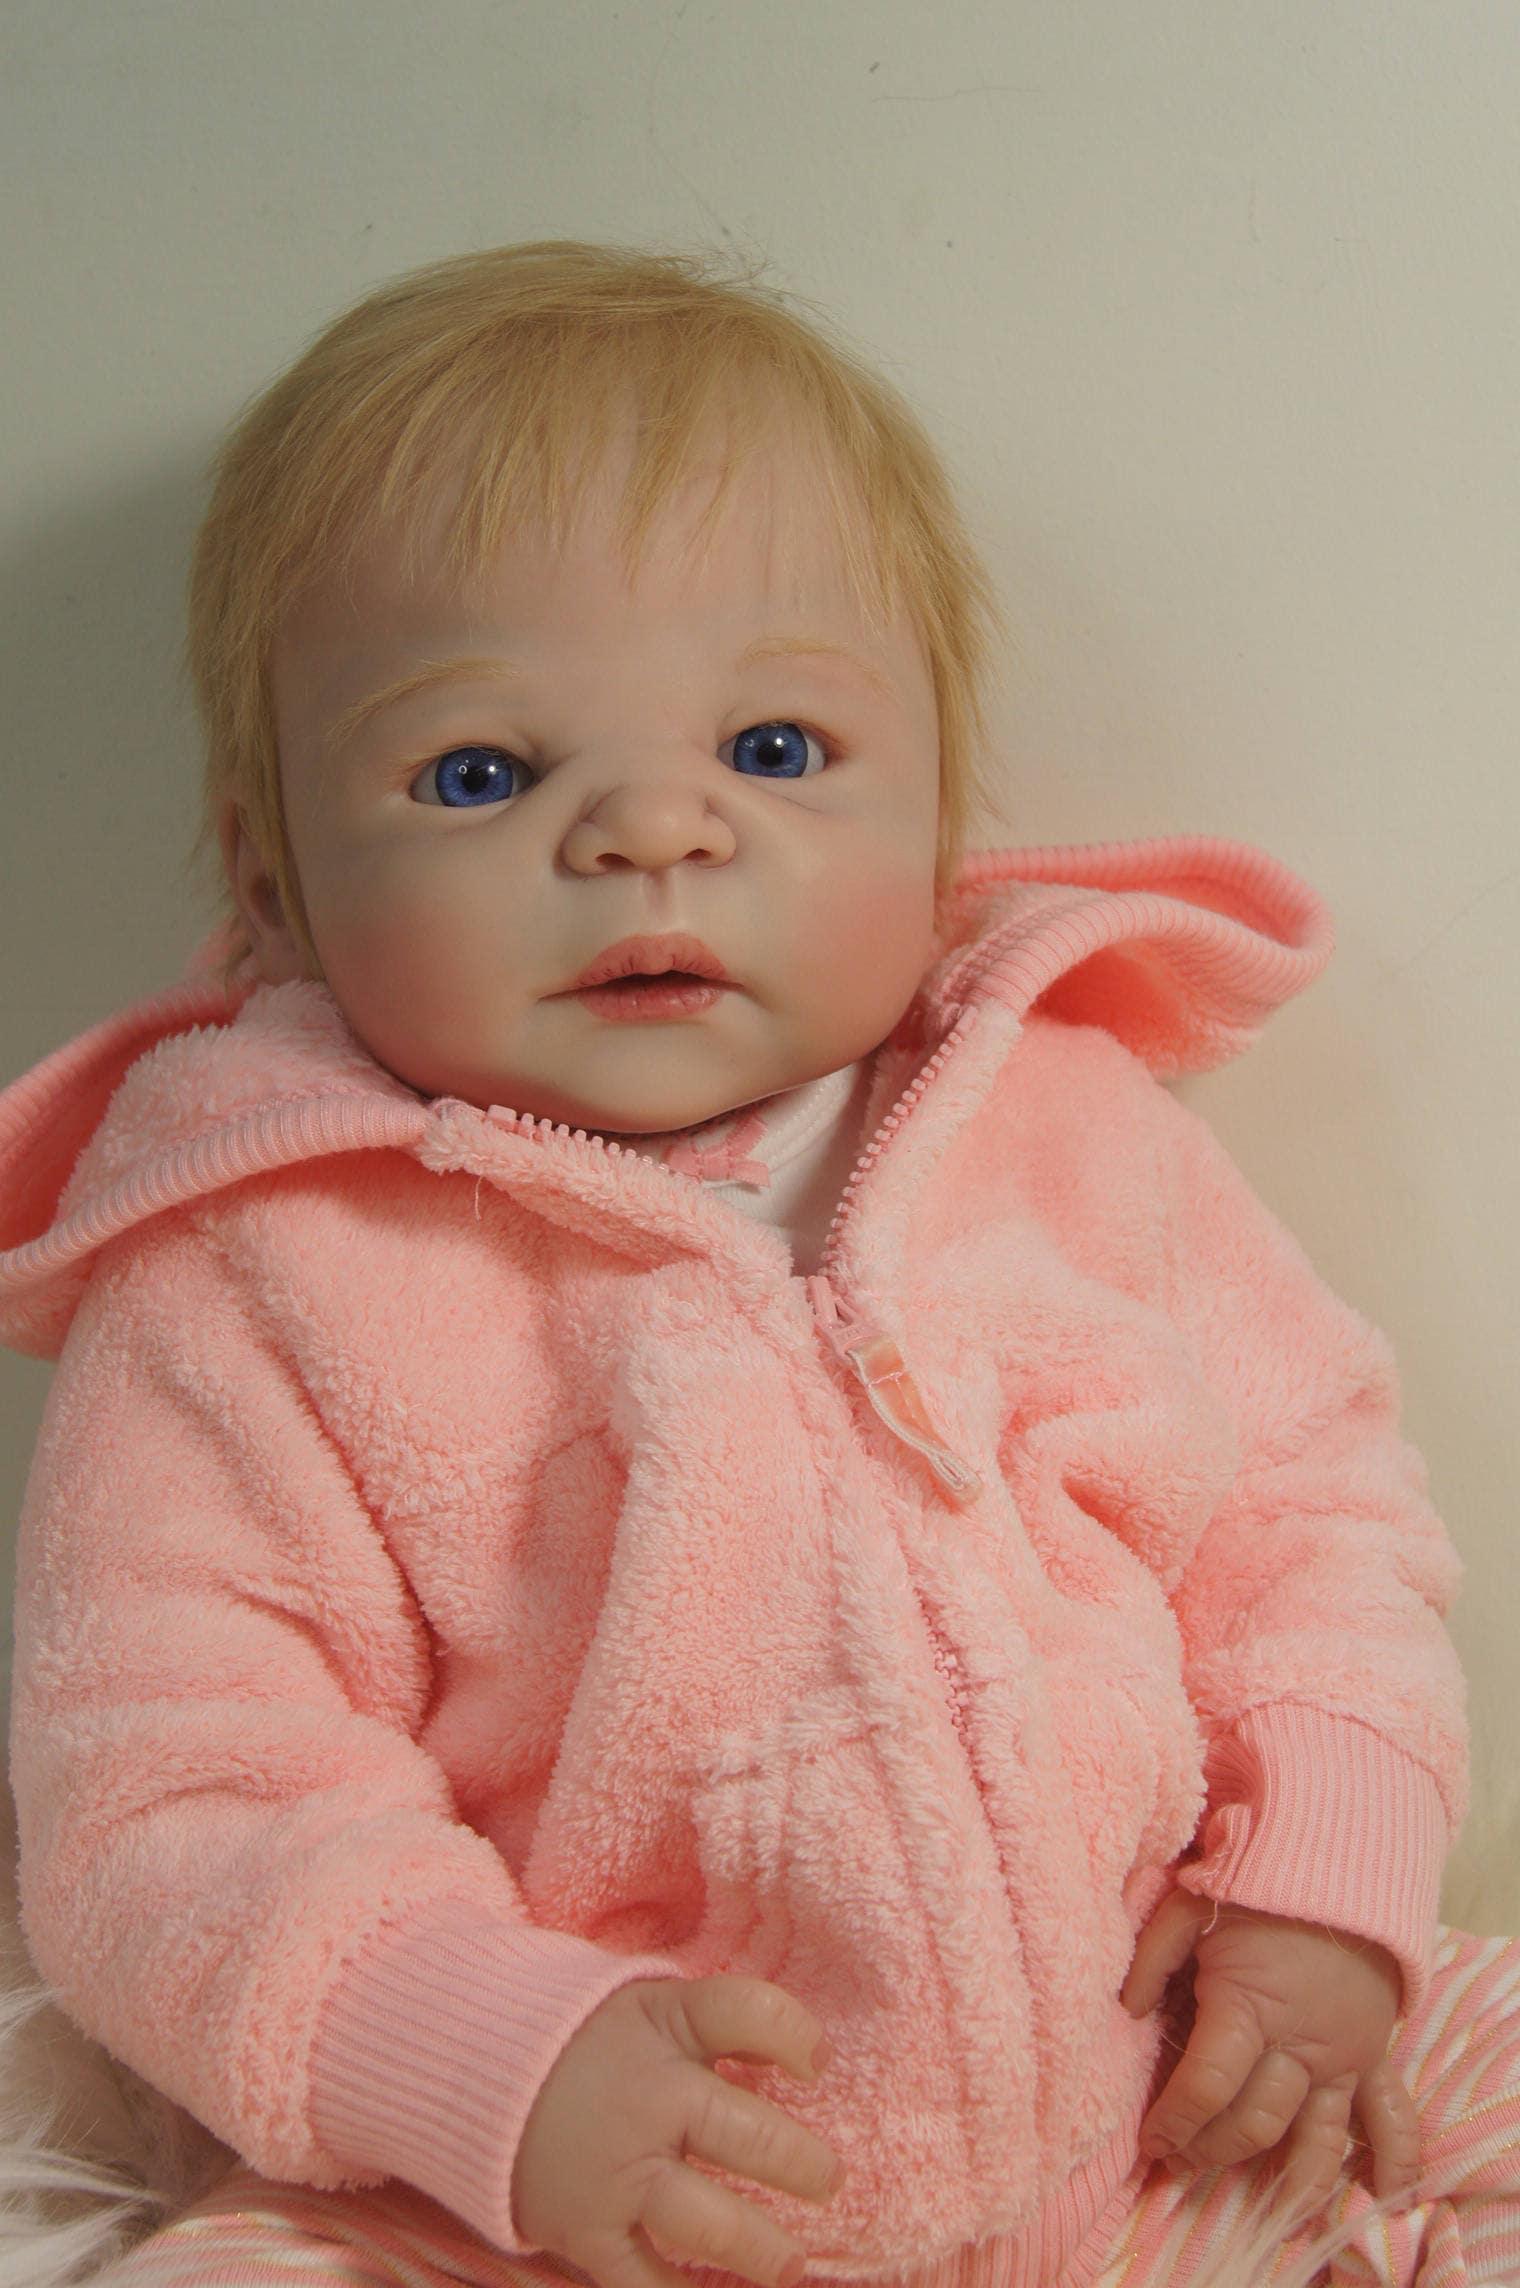 Ava Reborn Baby Doll Full Body Vinyl Silicone 23 Inch Girl